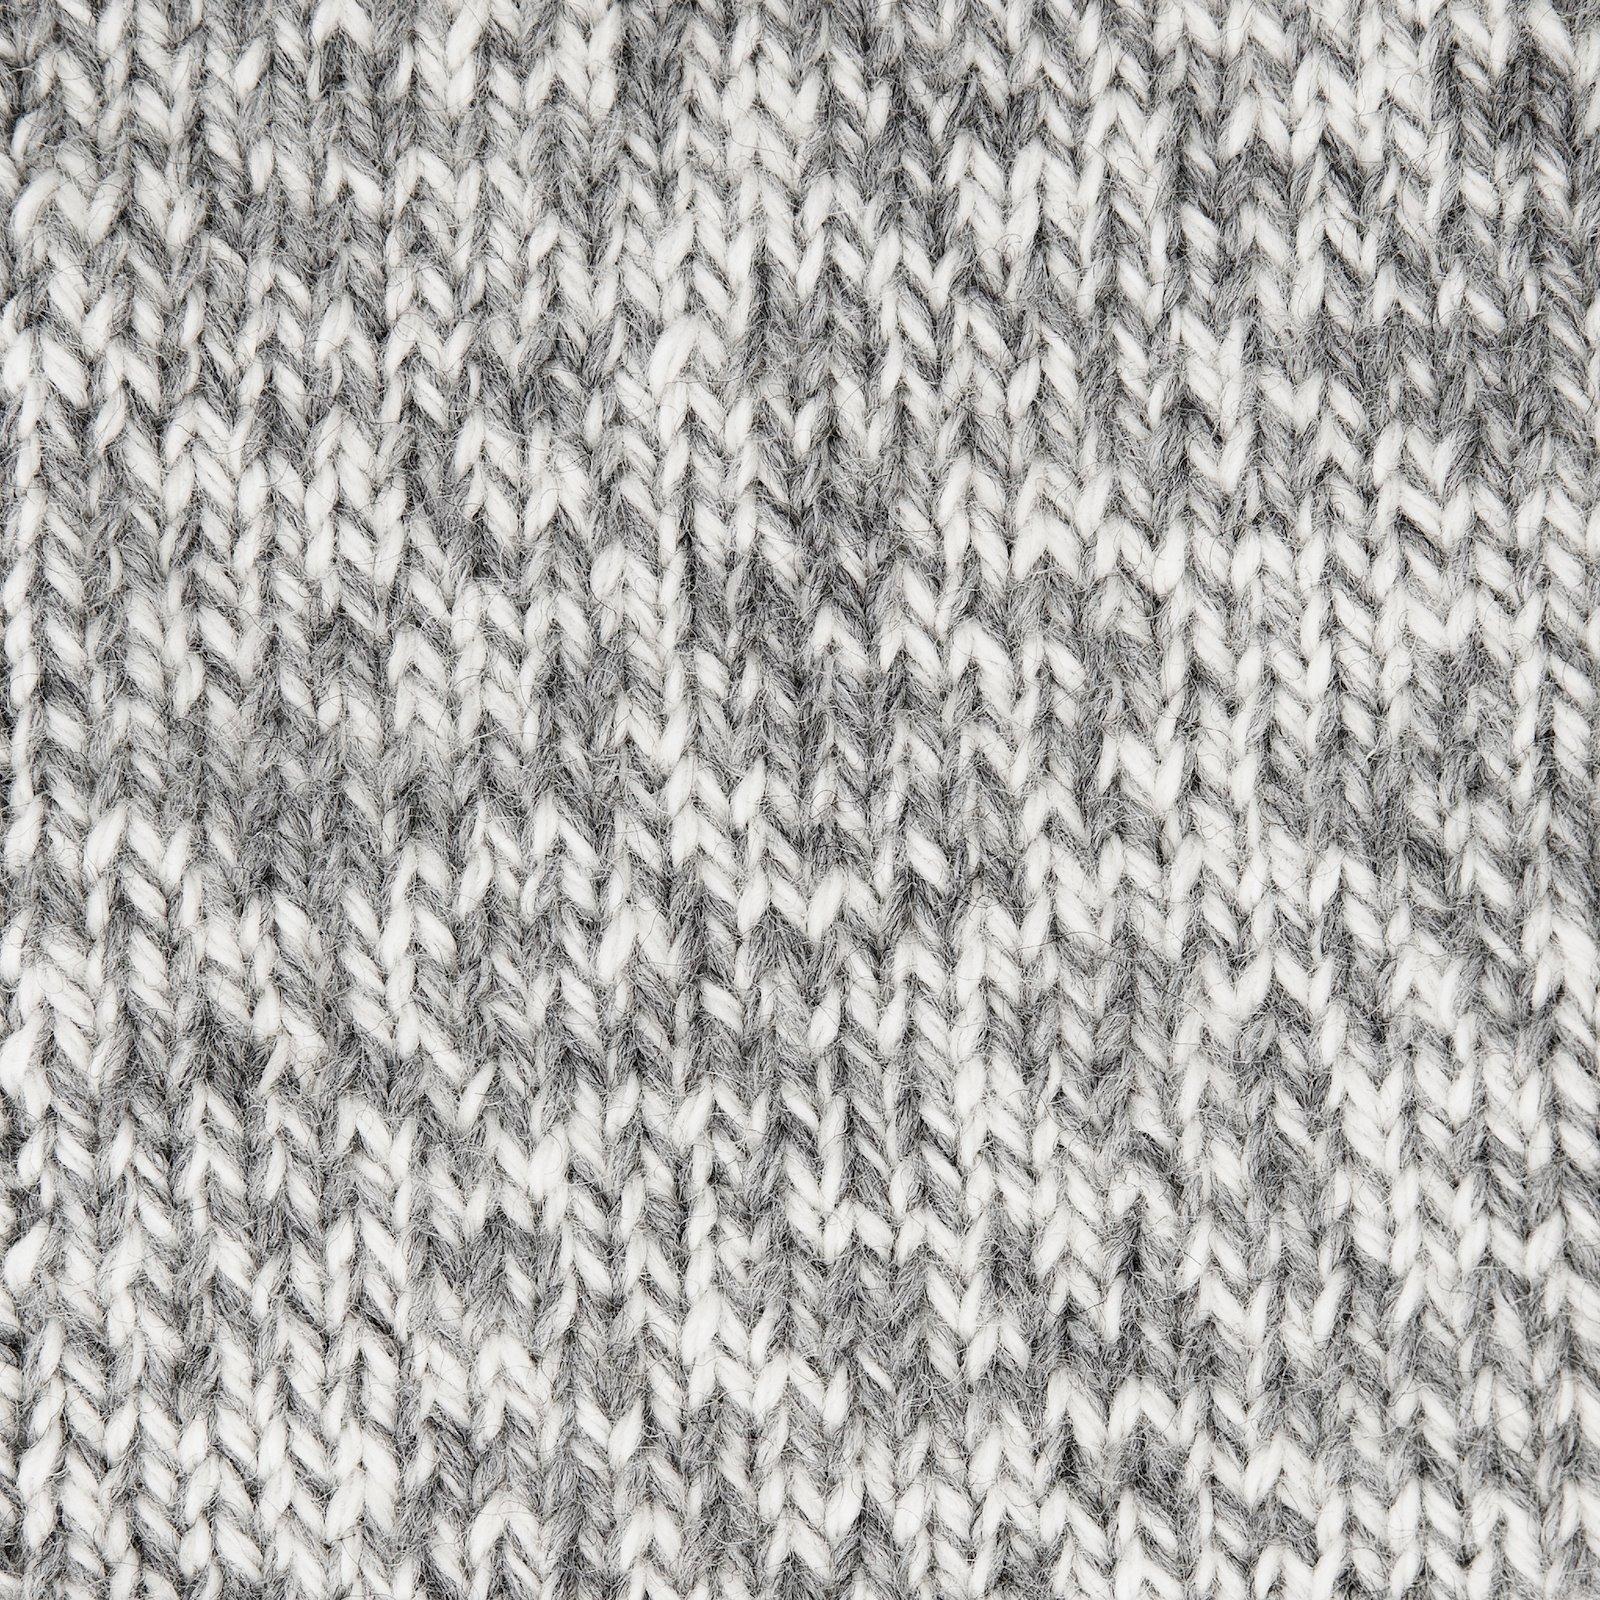 Tough dark grey melange 50g 90043042_90043041_90043033_sskit